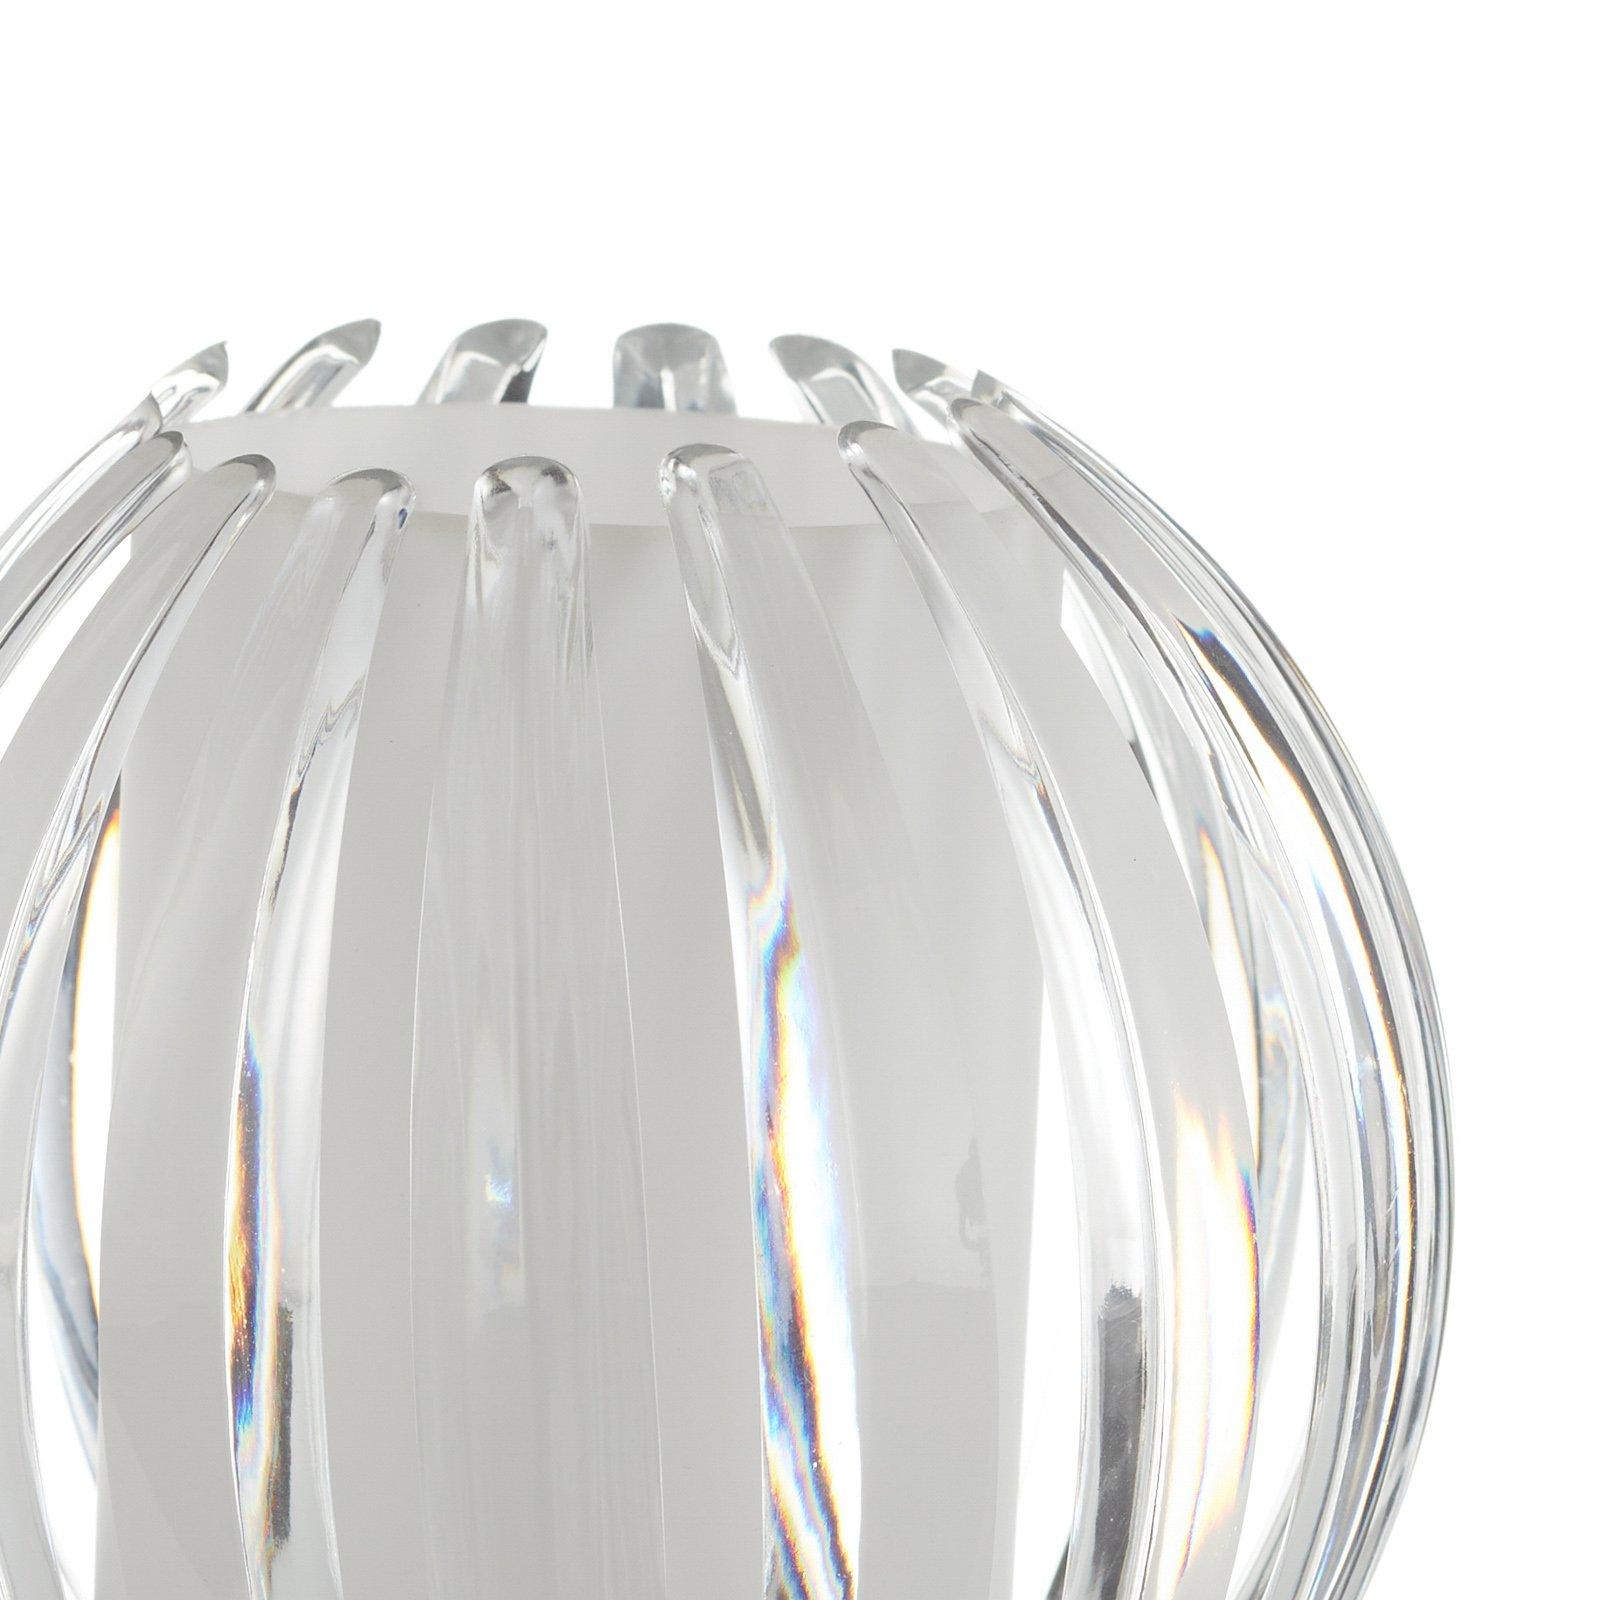 Bordlampe Claw med berøringsfunksjon, skjerm klar